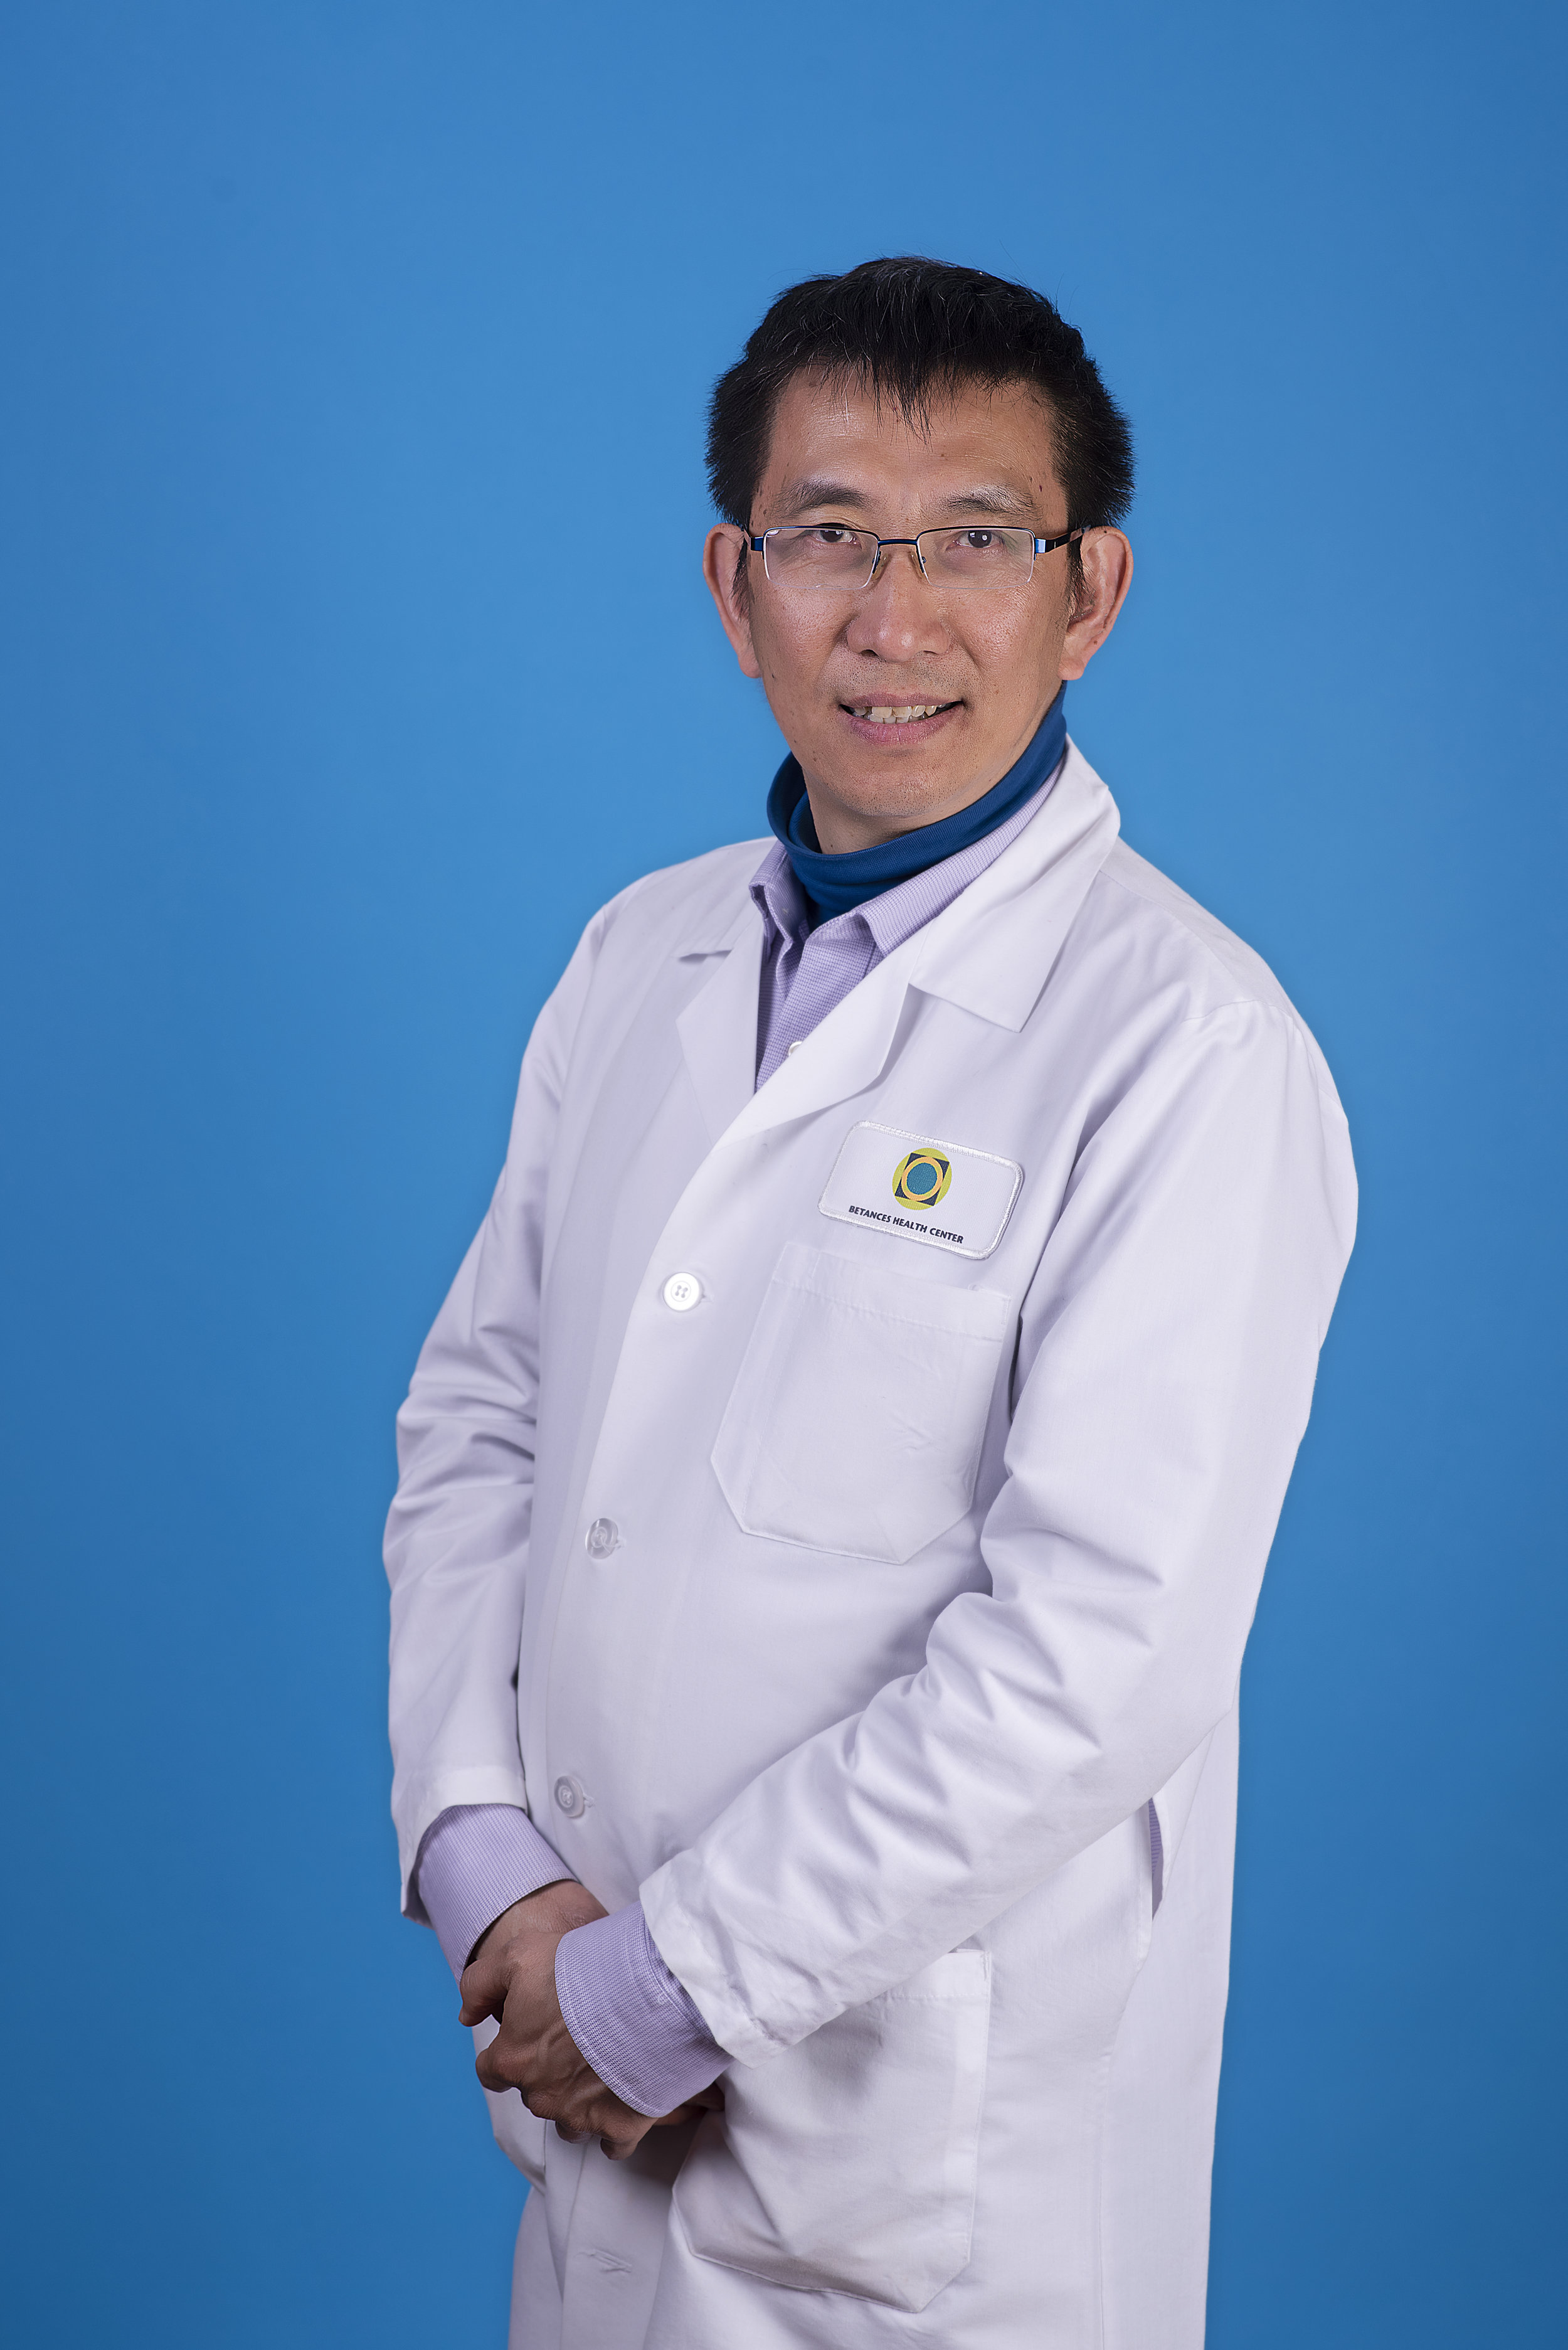 Phong Thai, DPM   Podiatrist